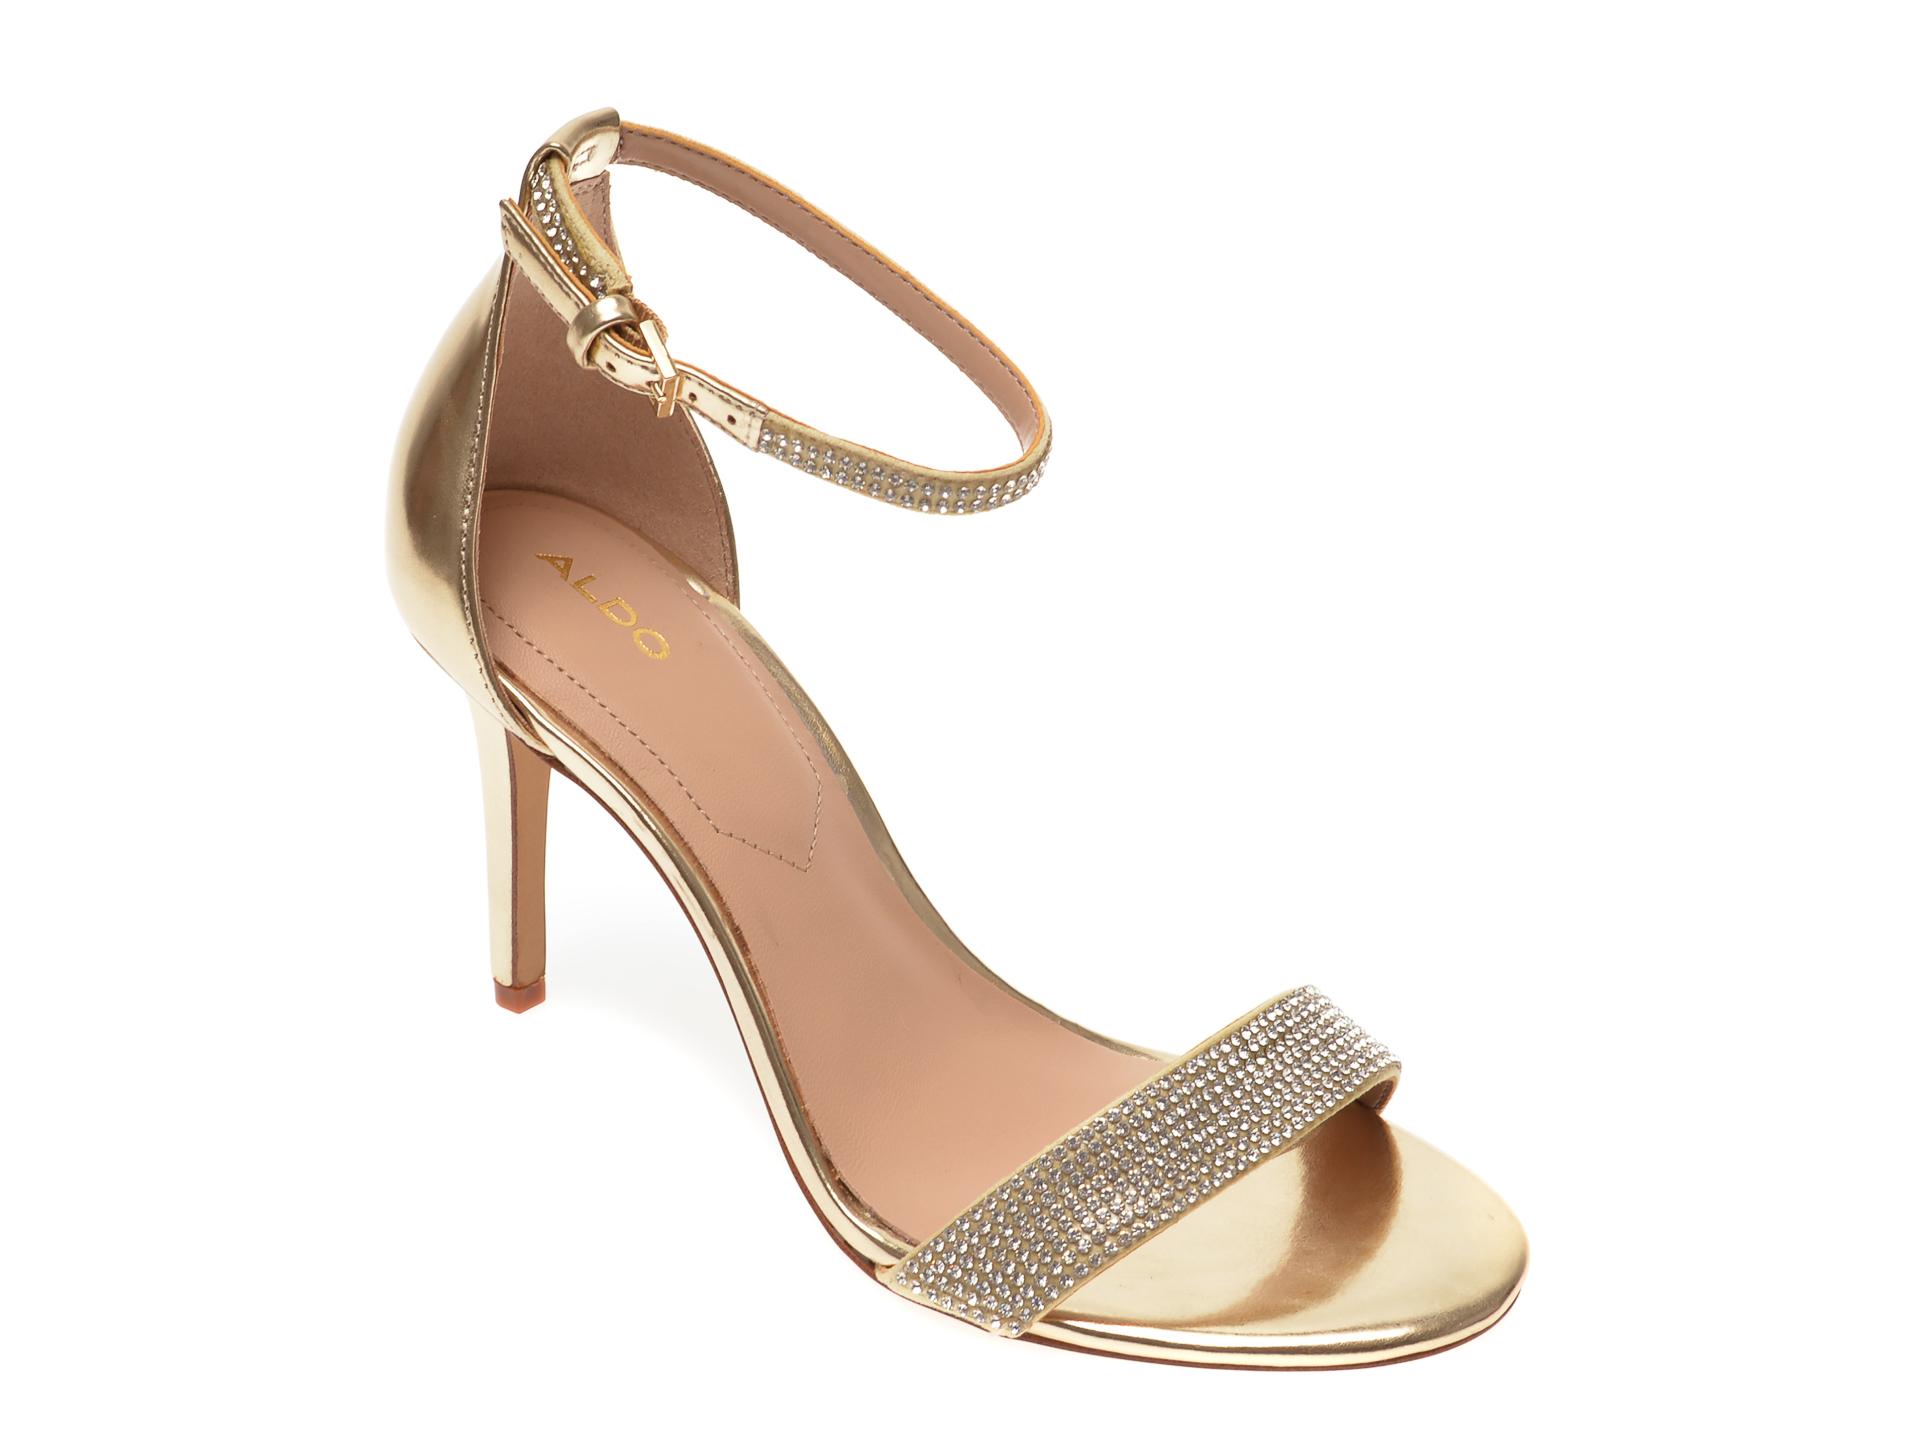 Sandale ALDO aurii, Alodien710, din piele ecologica New